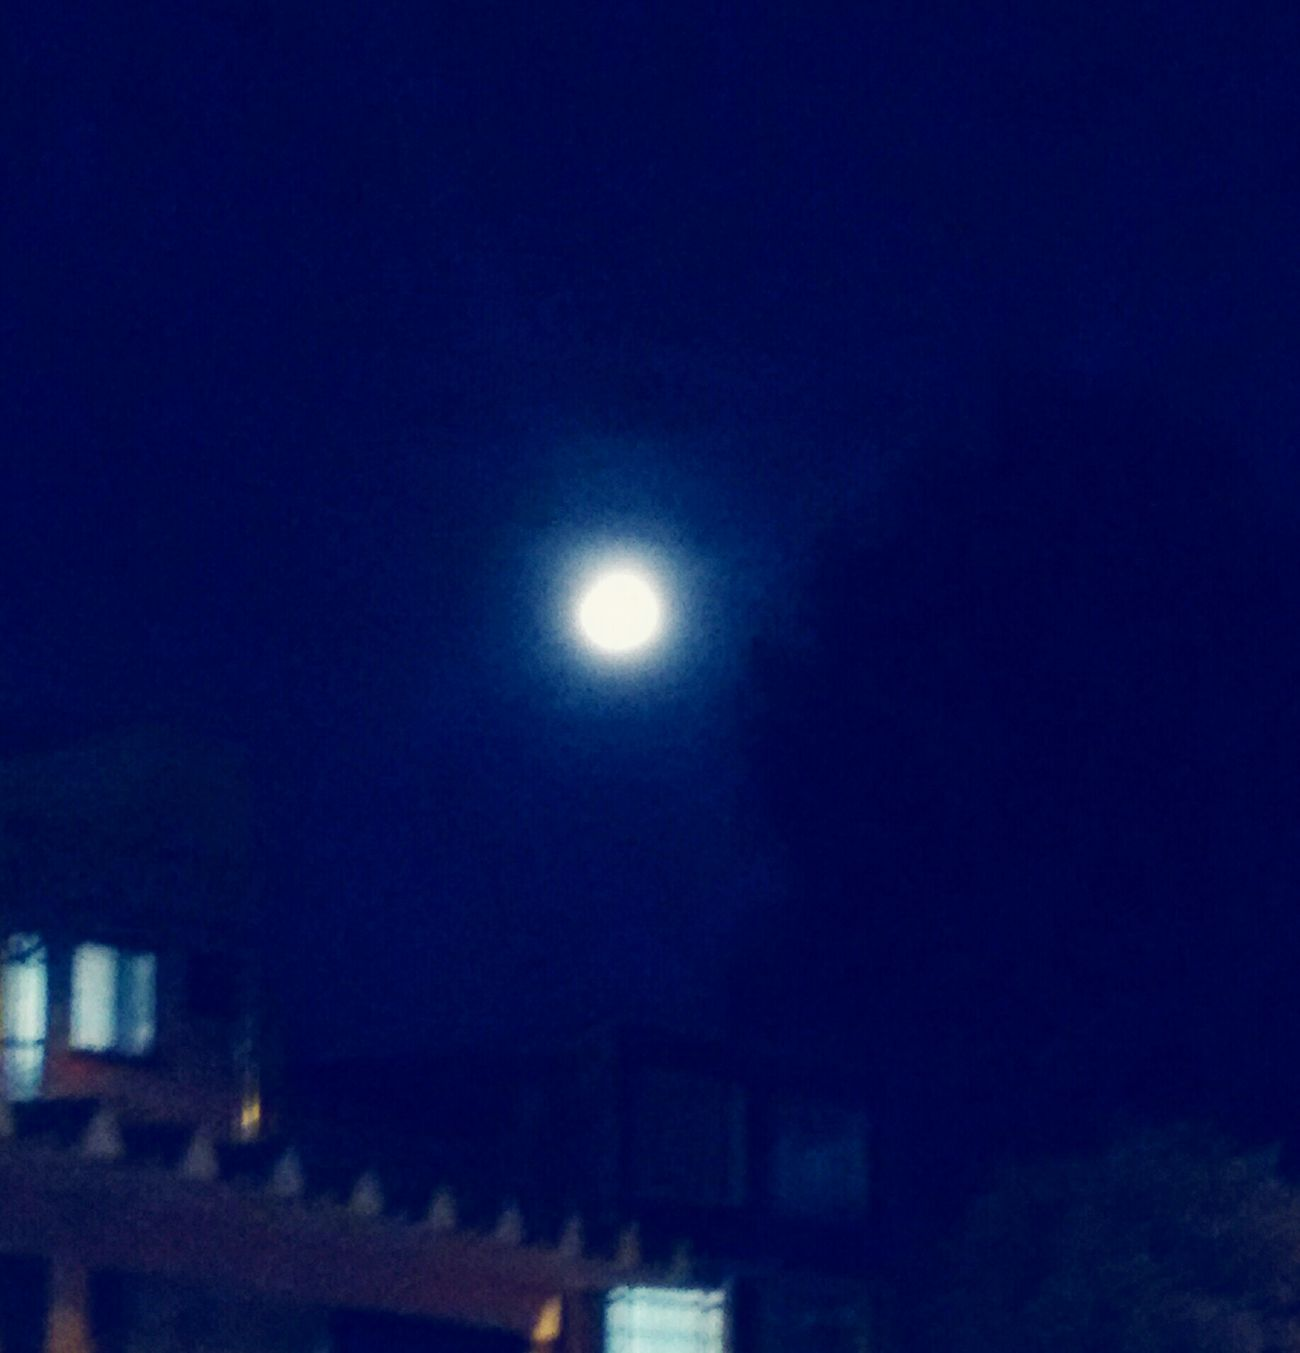 Goodnight Eveningtime Eyem Nature Lovers